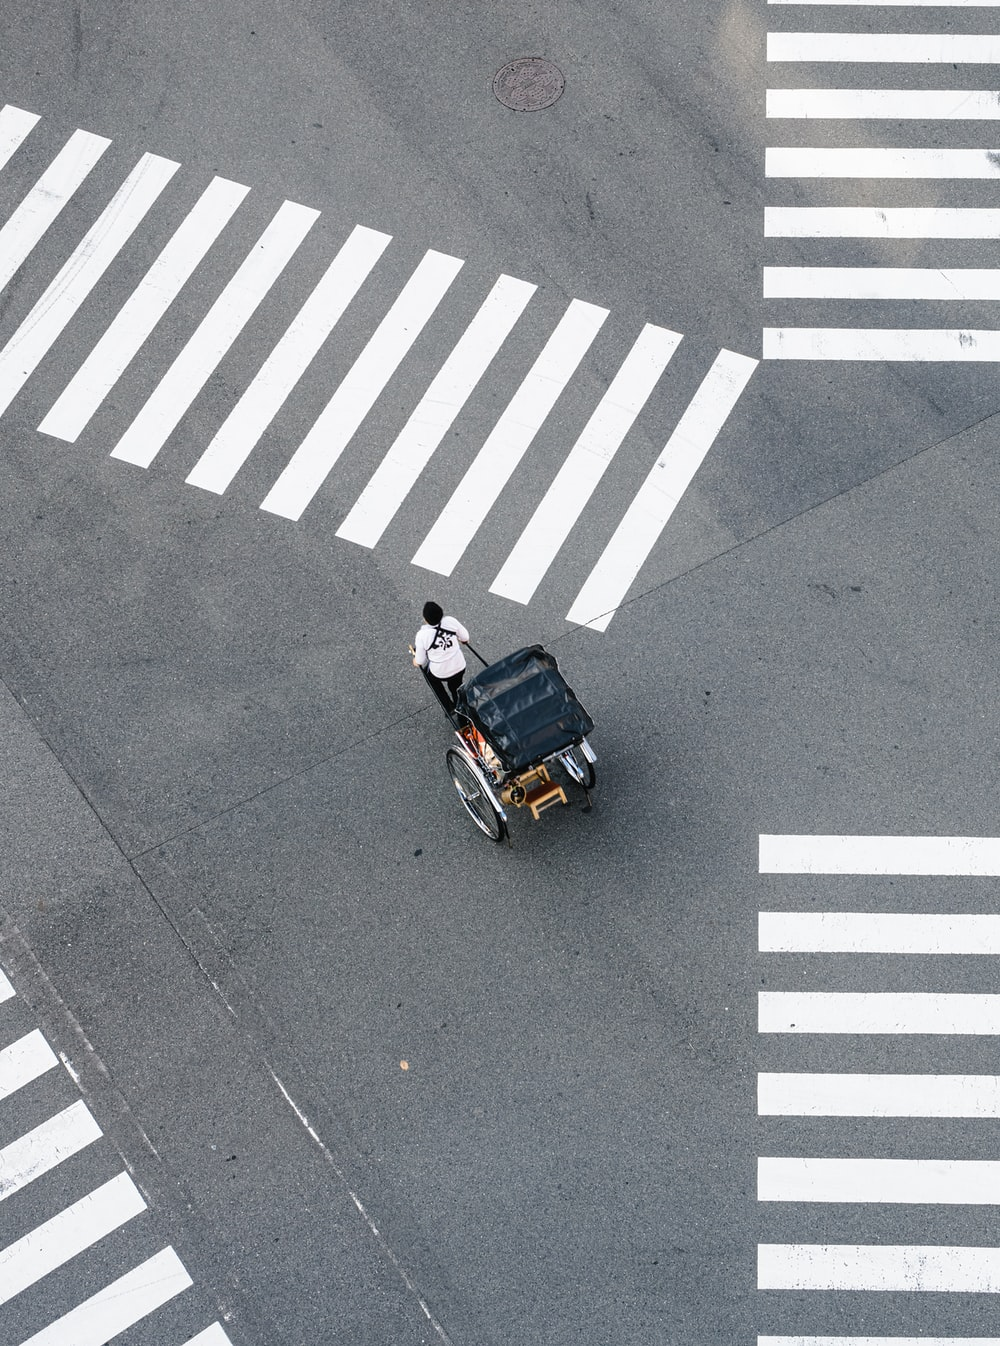 man pulling carriage crossing pedestrian